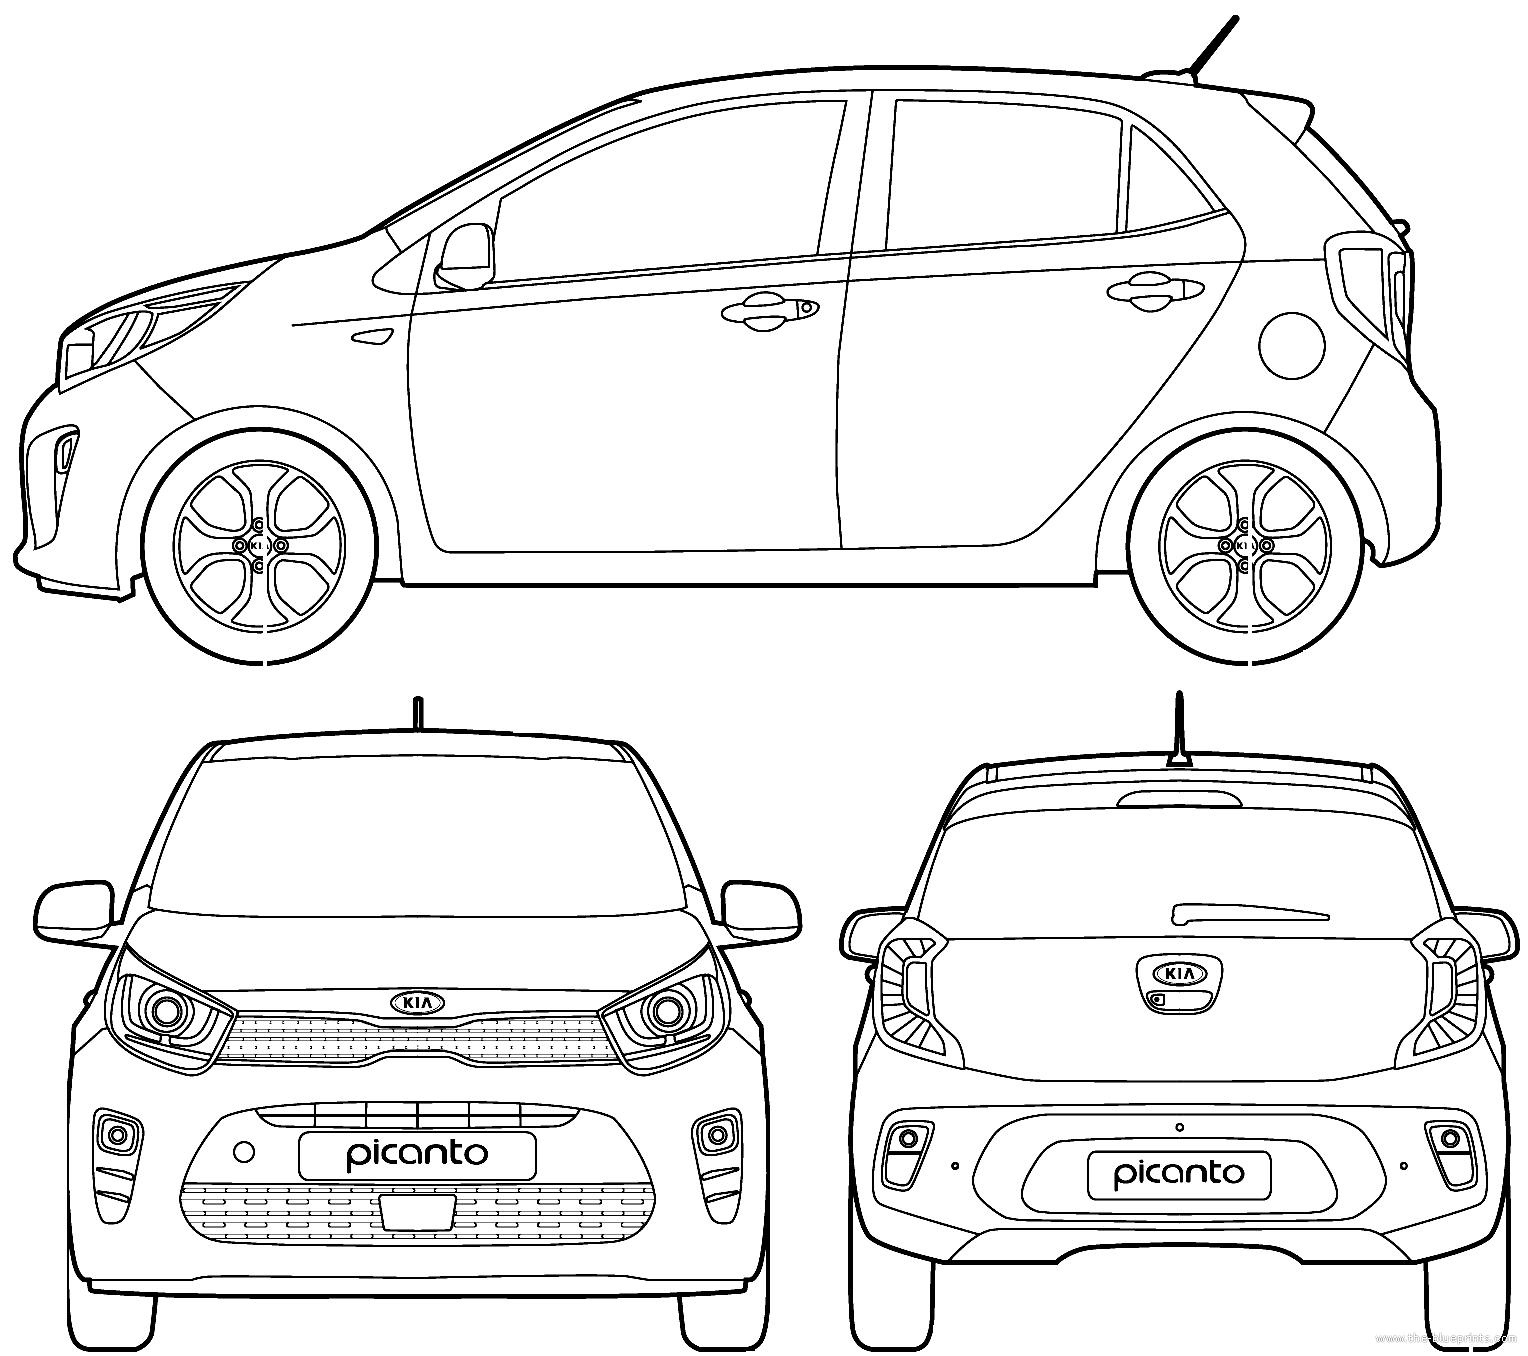 blueprints  u0026gt  cars  u0026gt  kia  u0026gt  kia picanto  2017